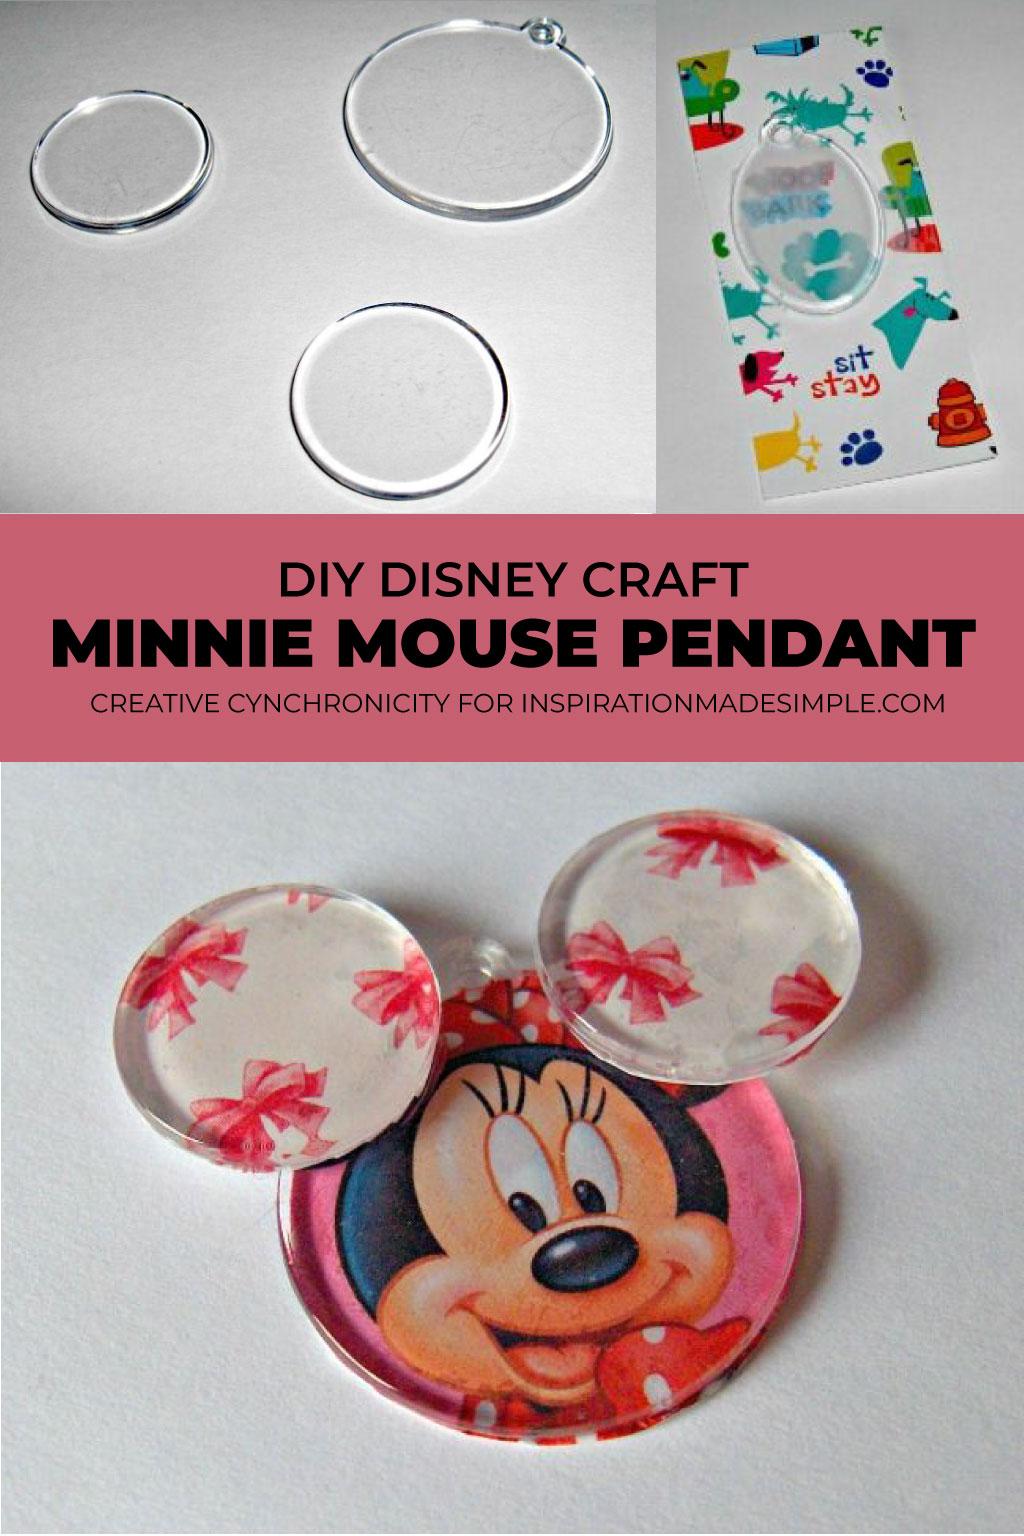 DIY Disney Craft: Minnie Mouse Pendant